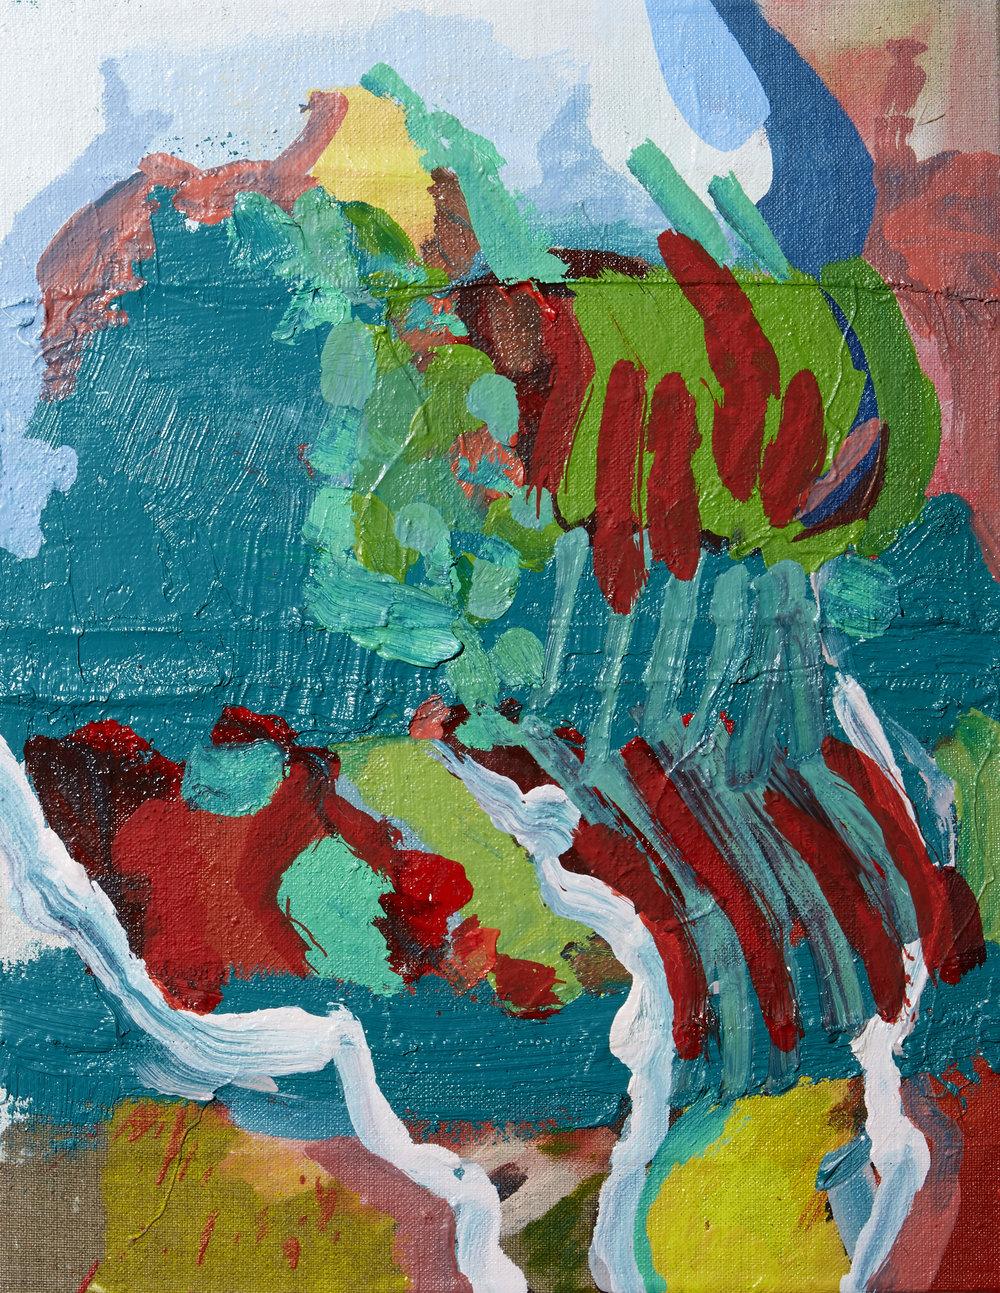 'Rag' Karl Bielik Oil on linen on panel 45x35 cms 2017